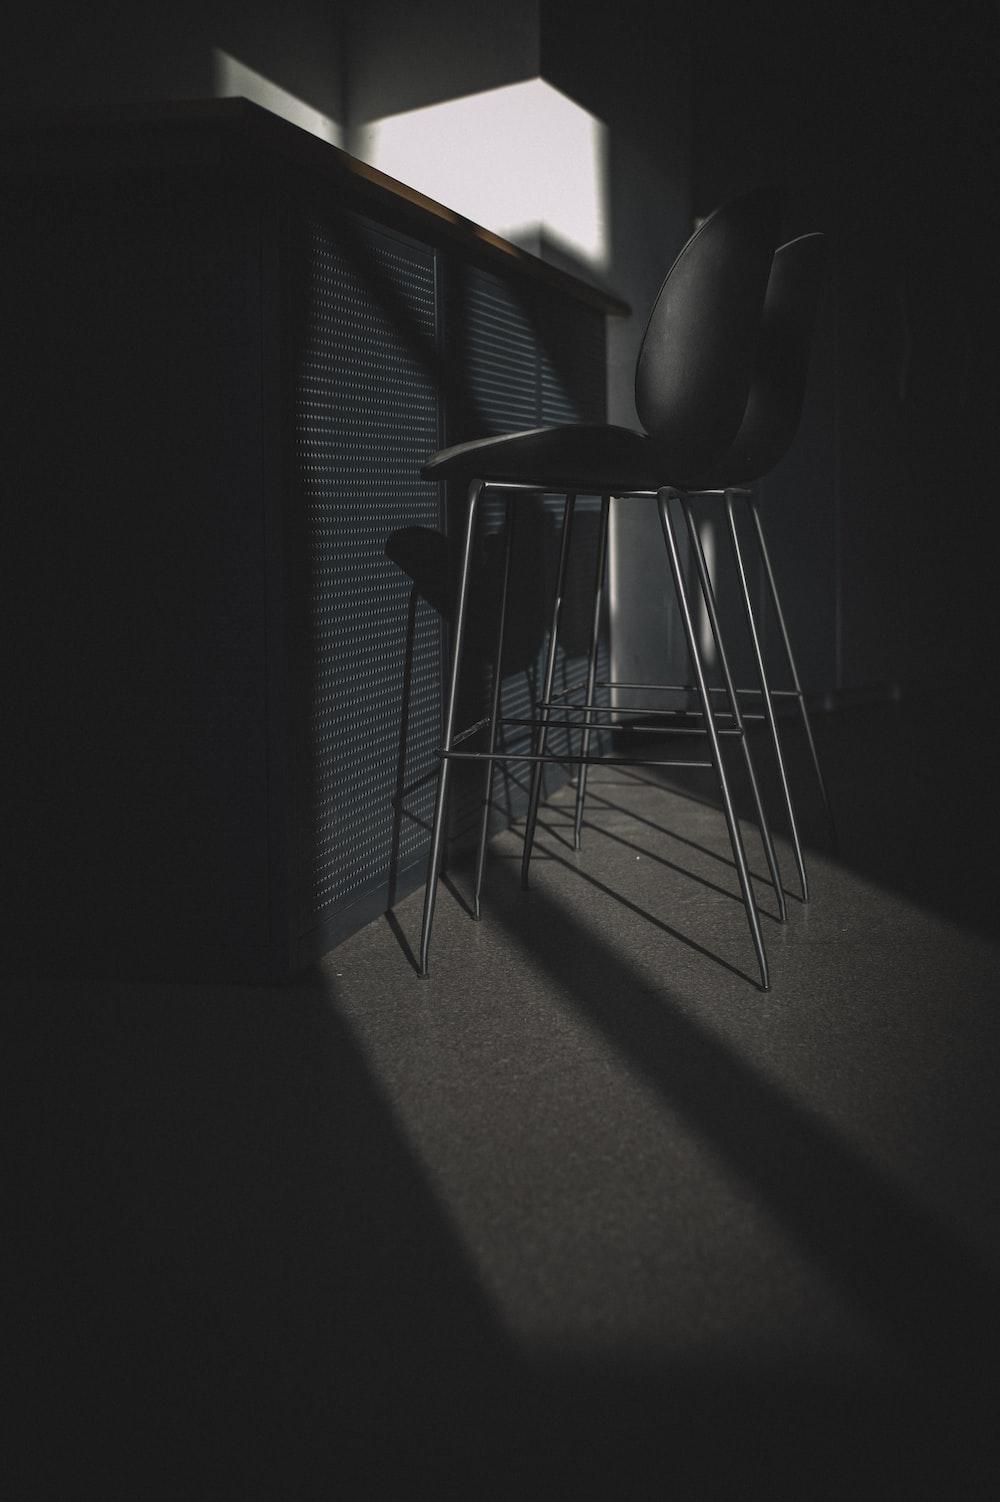 black leather padded chair near window